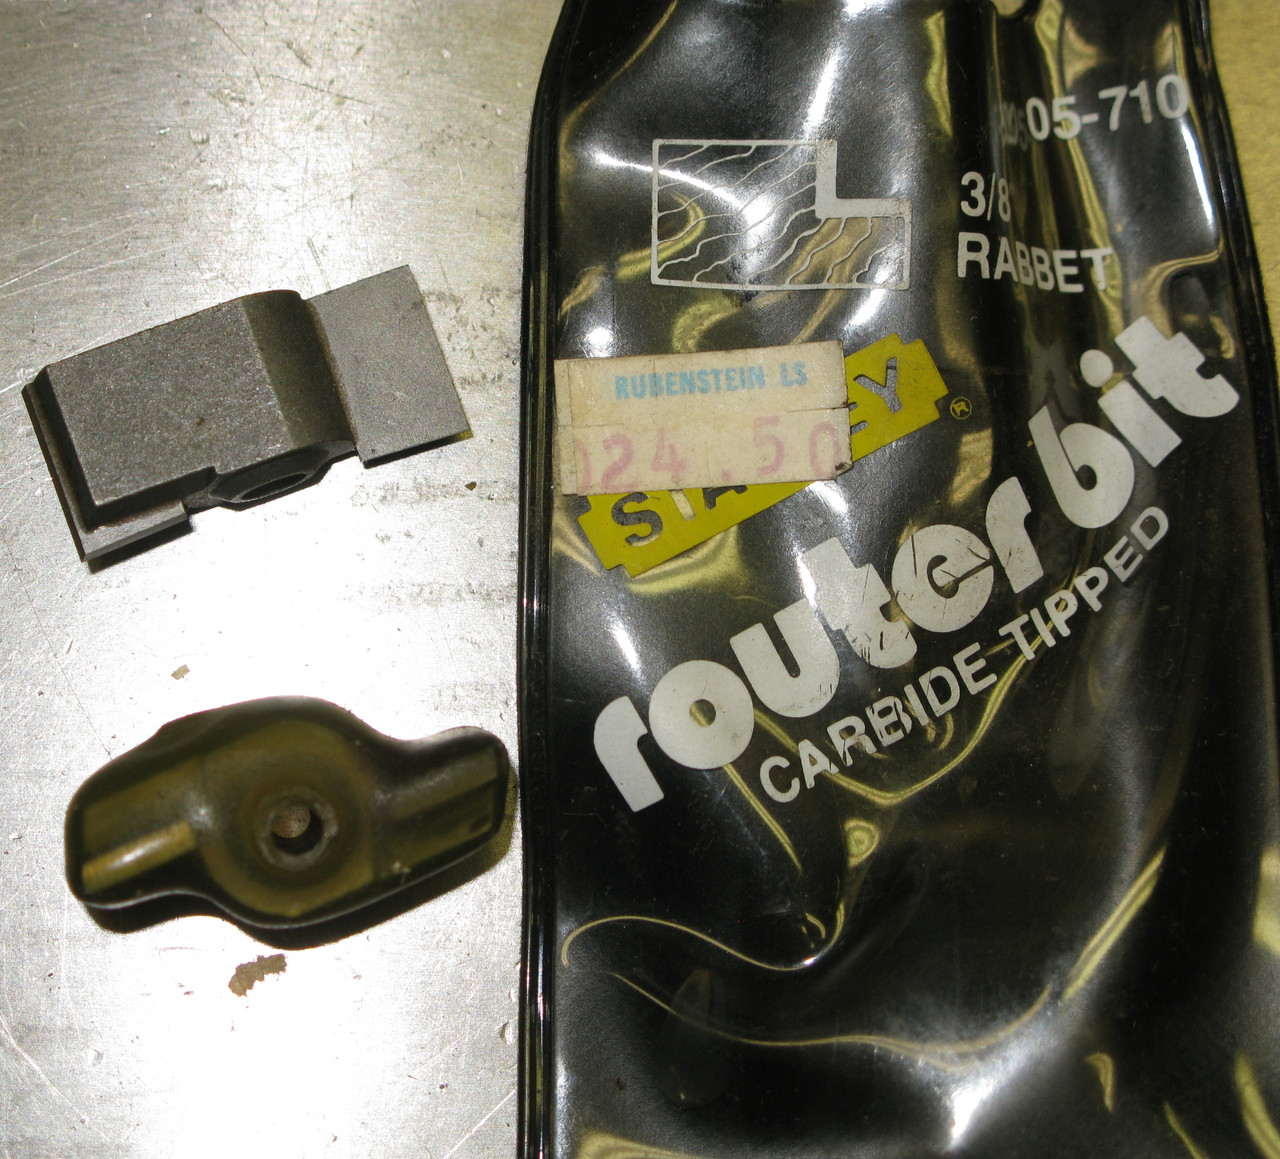 Stanley Router Bit 05-710 Rabbet, Carbide, 3/8 Inch, NOS USA